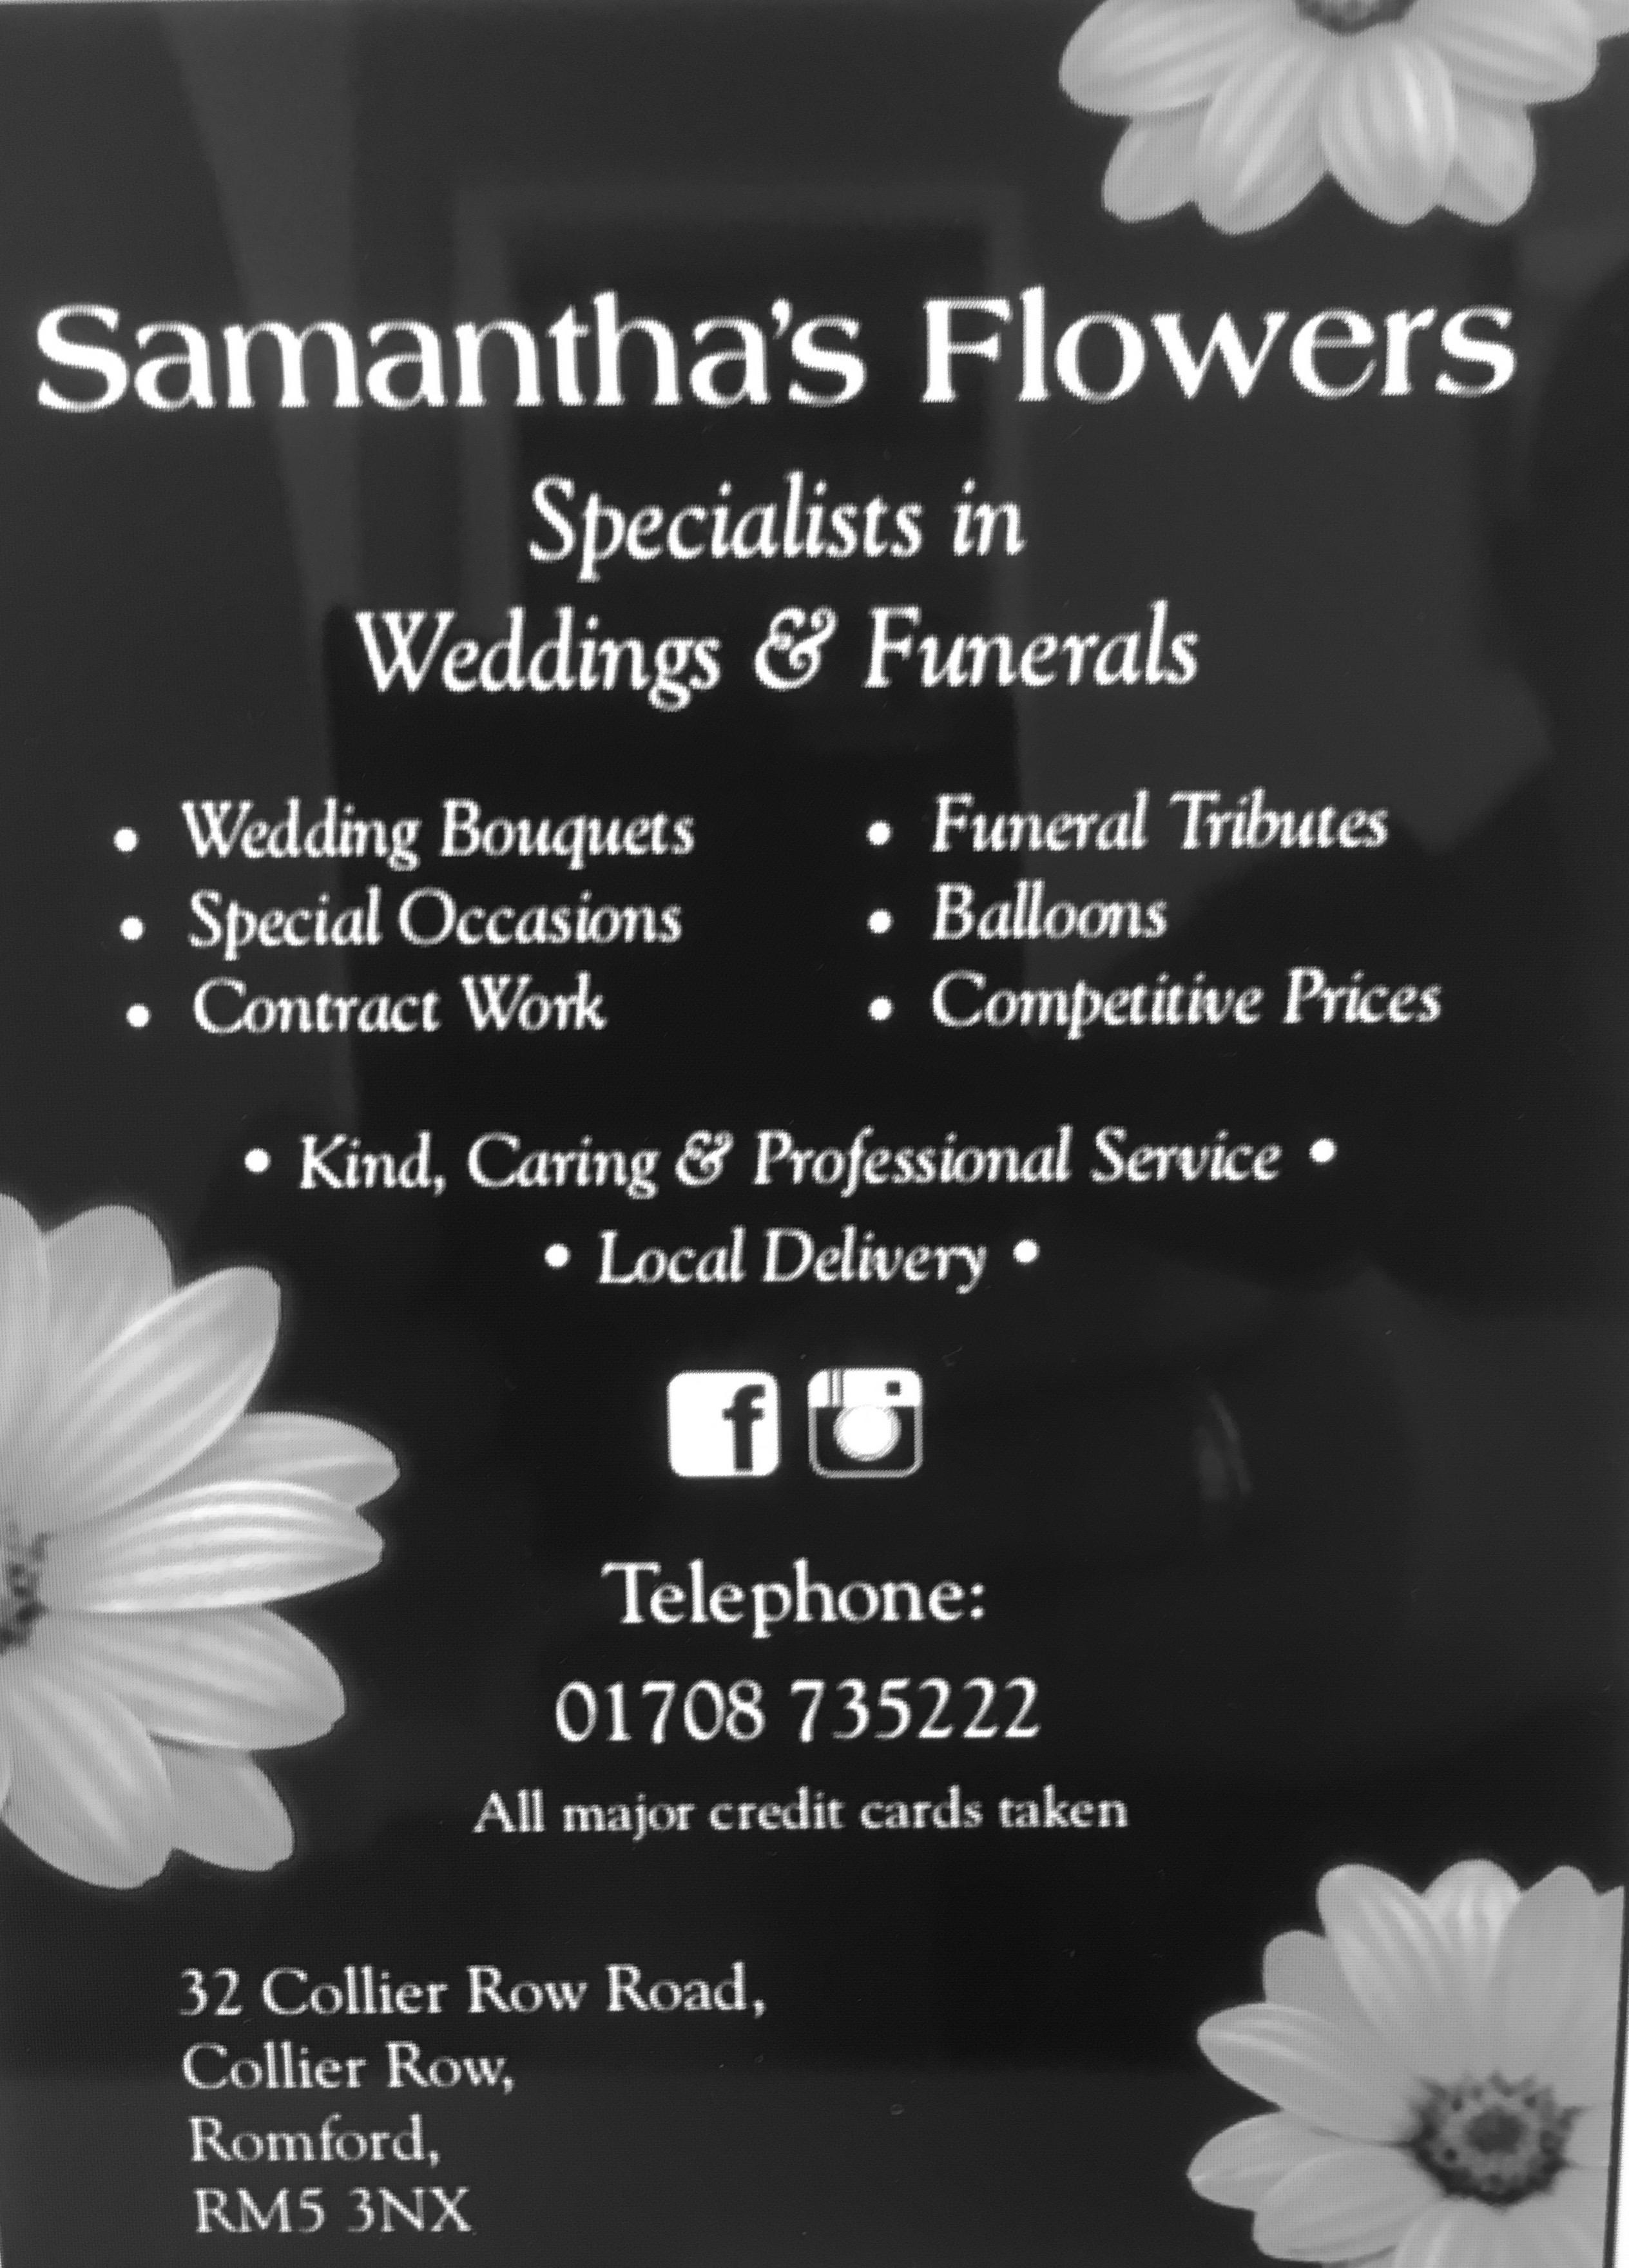 Samanthas Flowers